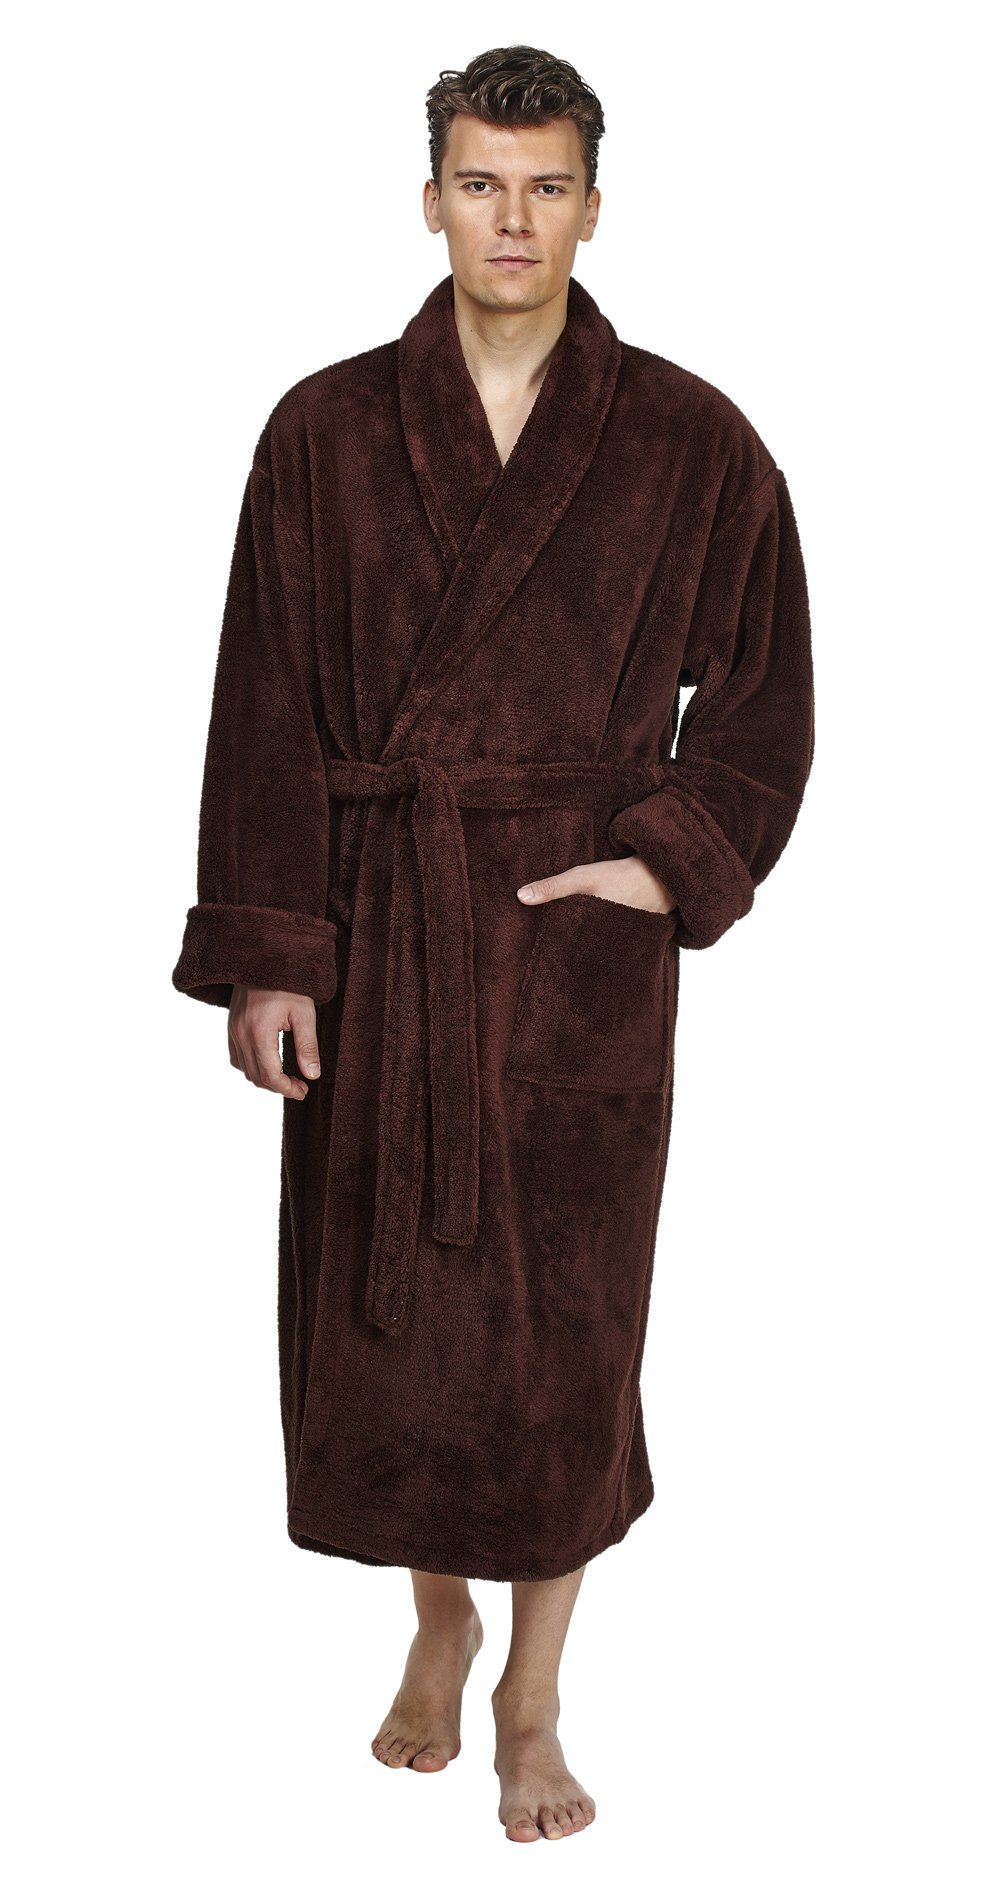 Arus Men's Shawl Fleece Bathrobe Turkish Soft Plush Robe, Brown, L/XL